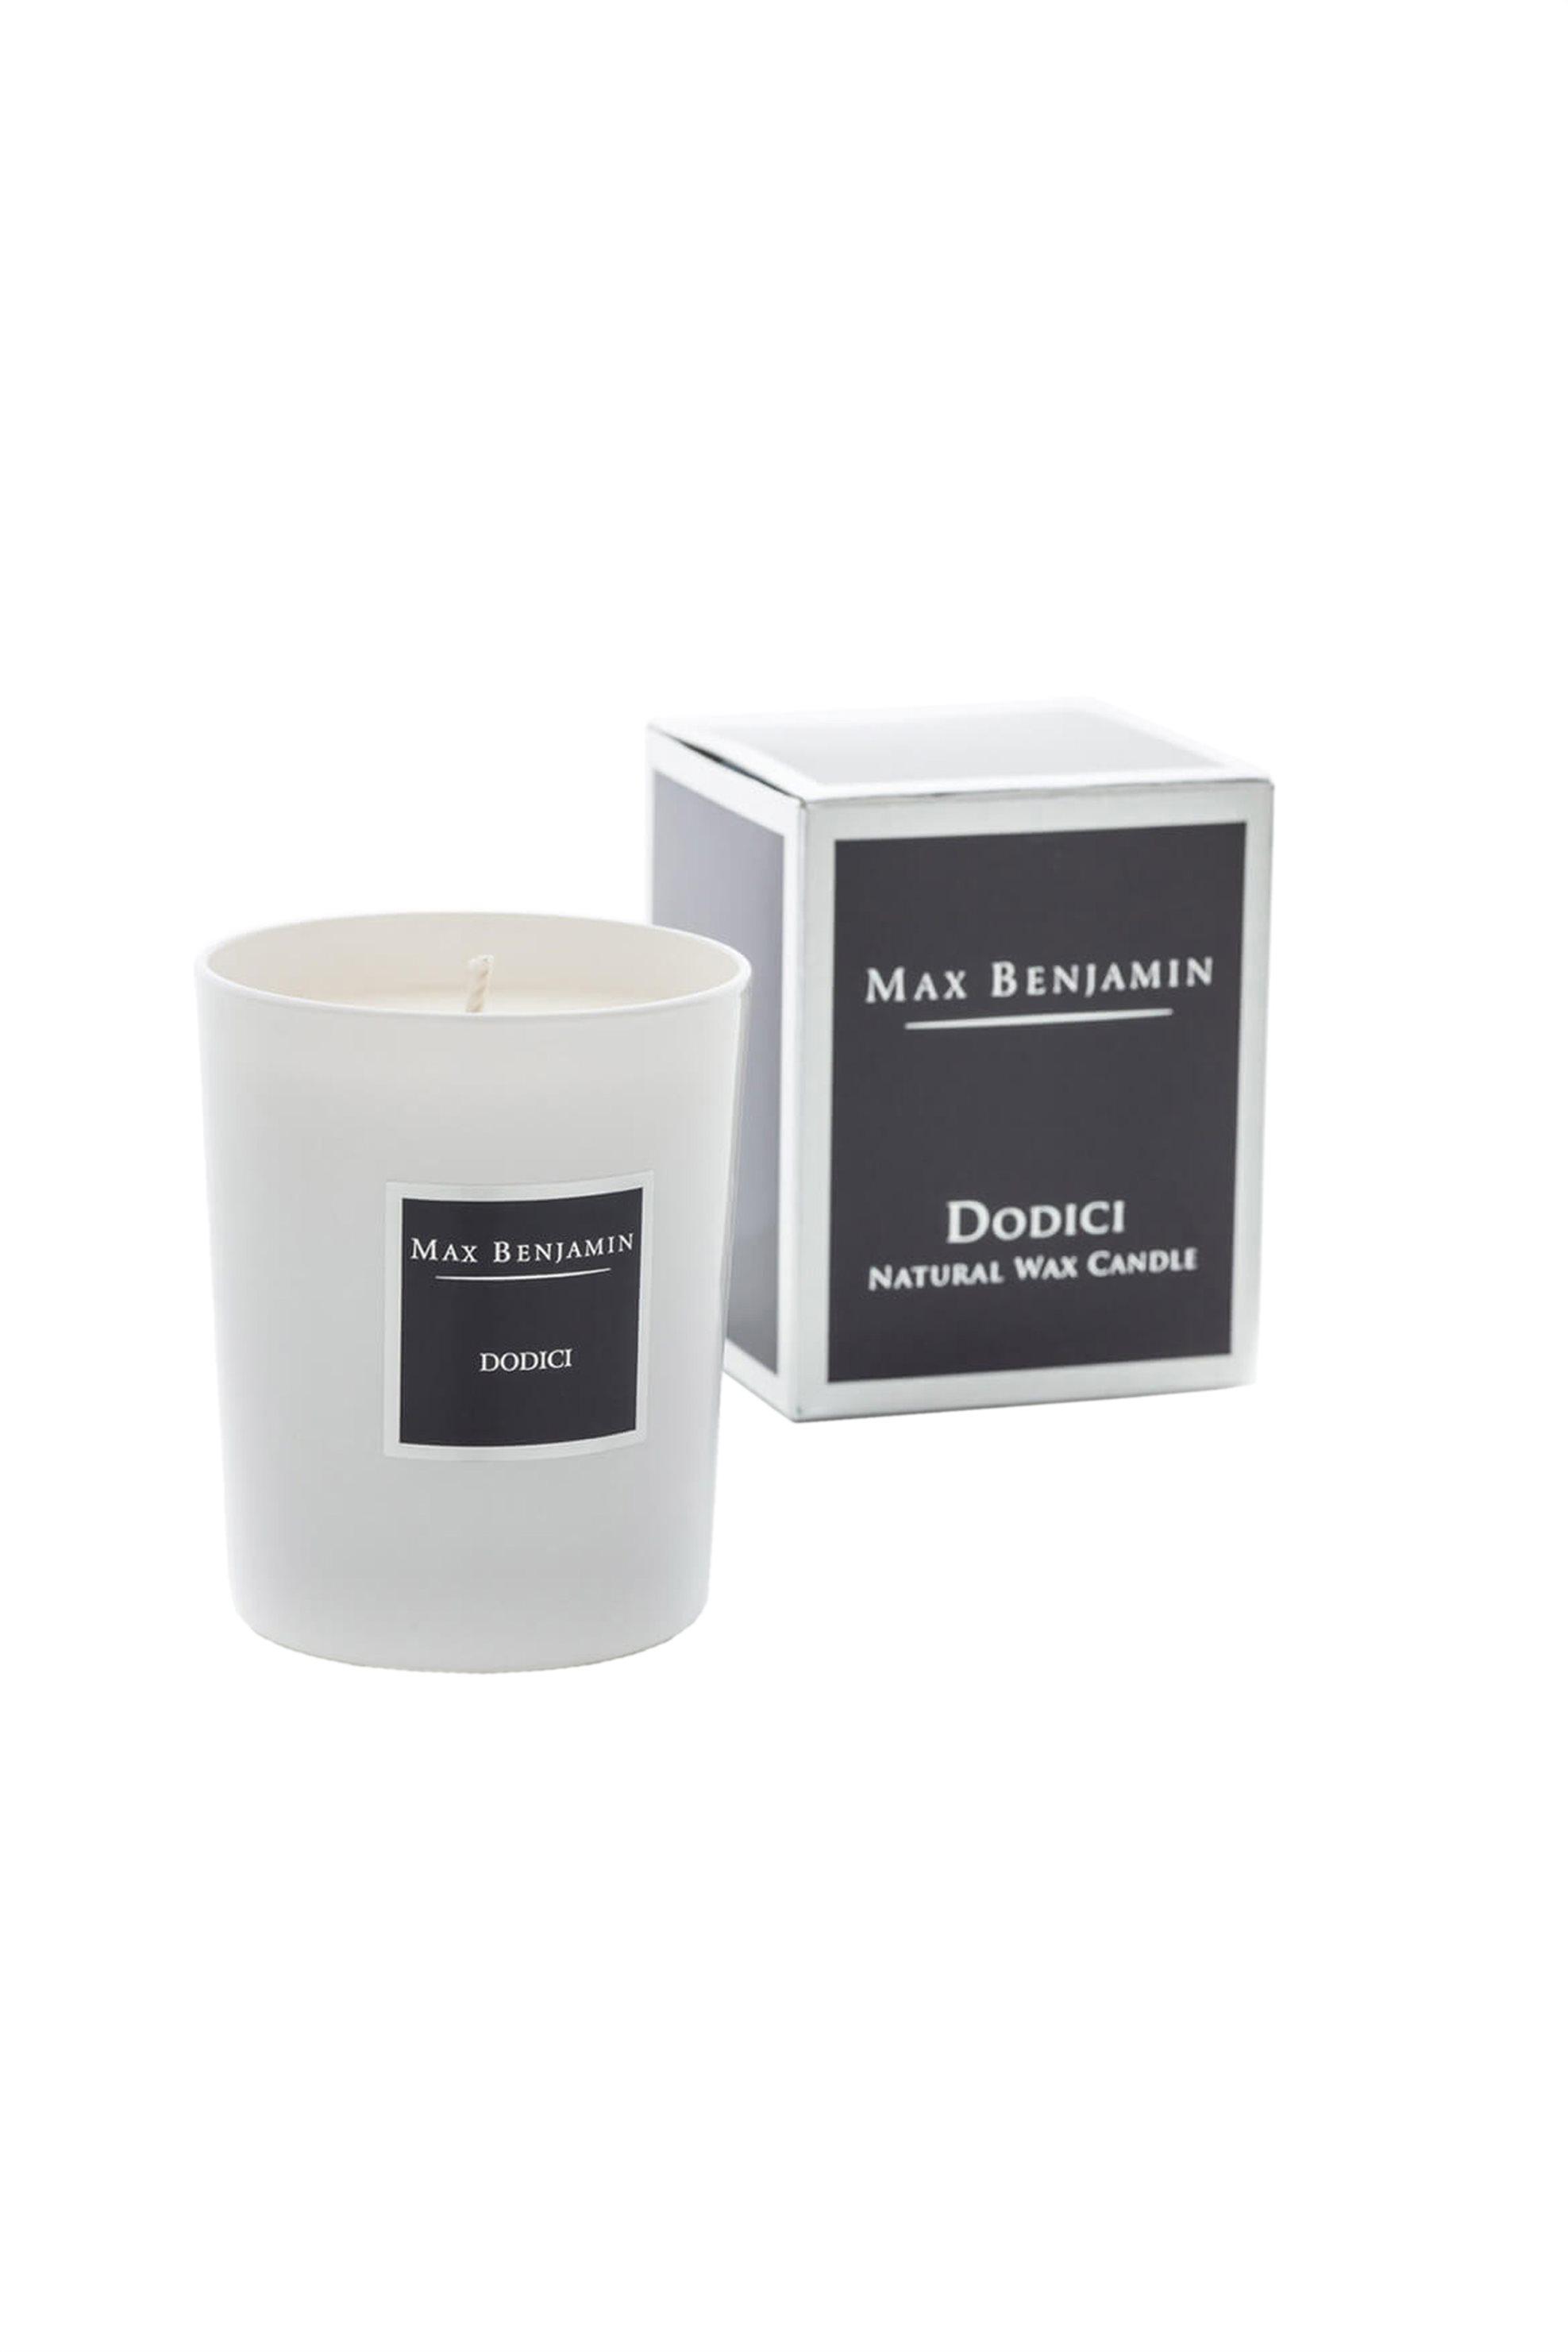 Max Benjamin αρωματικό κερί Dodici - 155-3551 home   σαλονι   αρωματικά χώρου